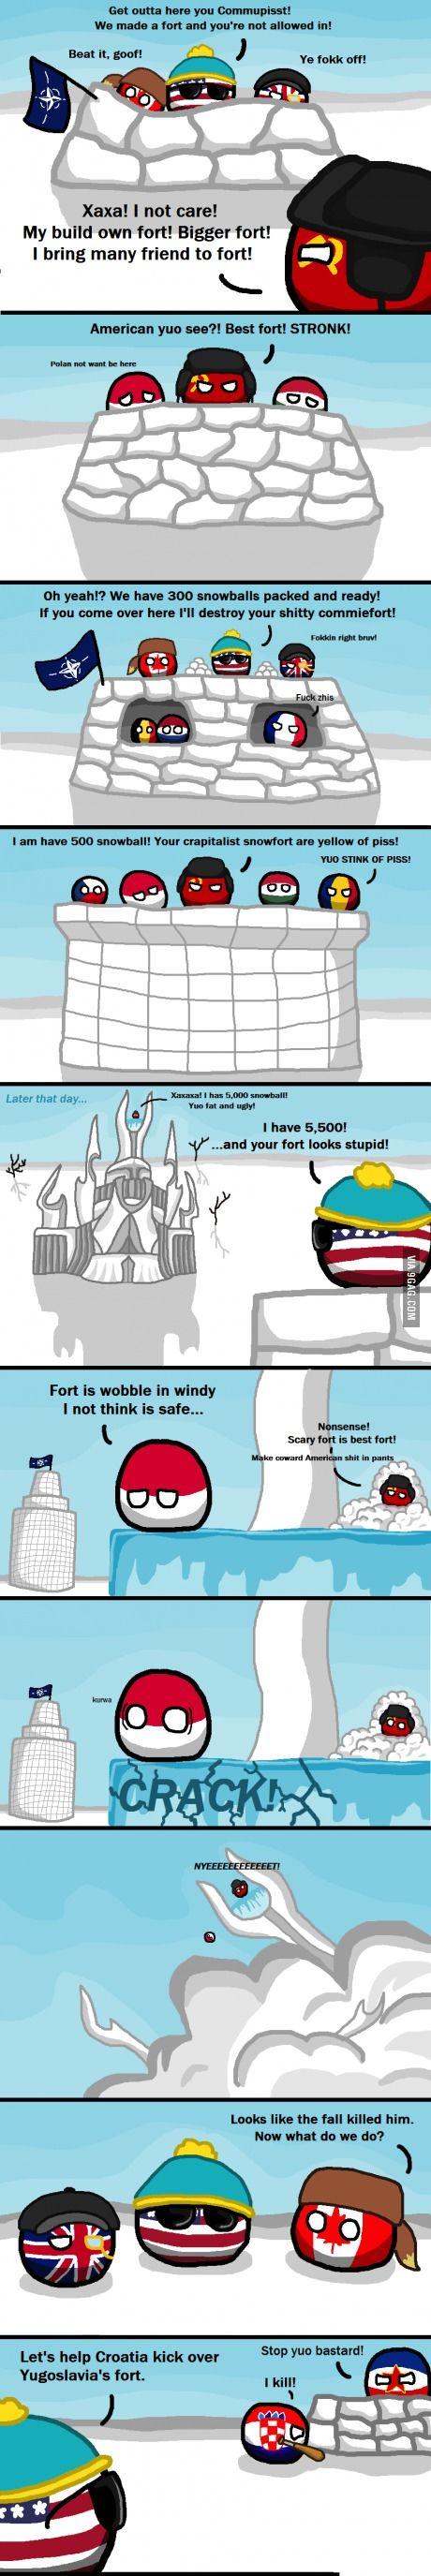 A Very Cold War. Sad but true !